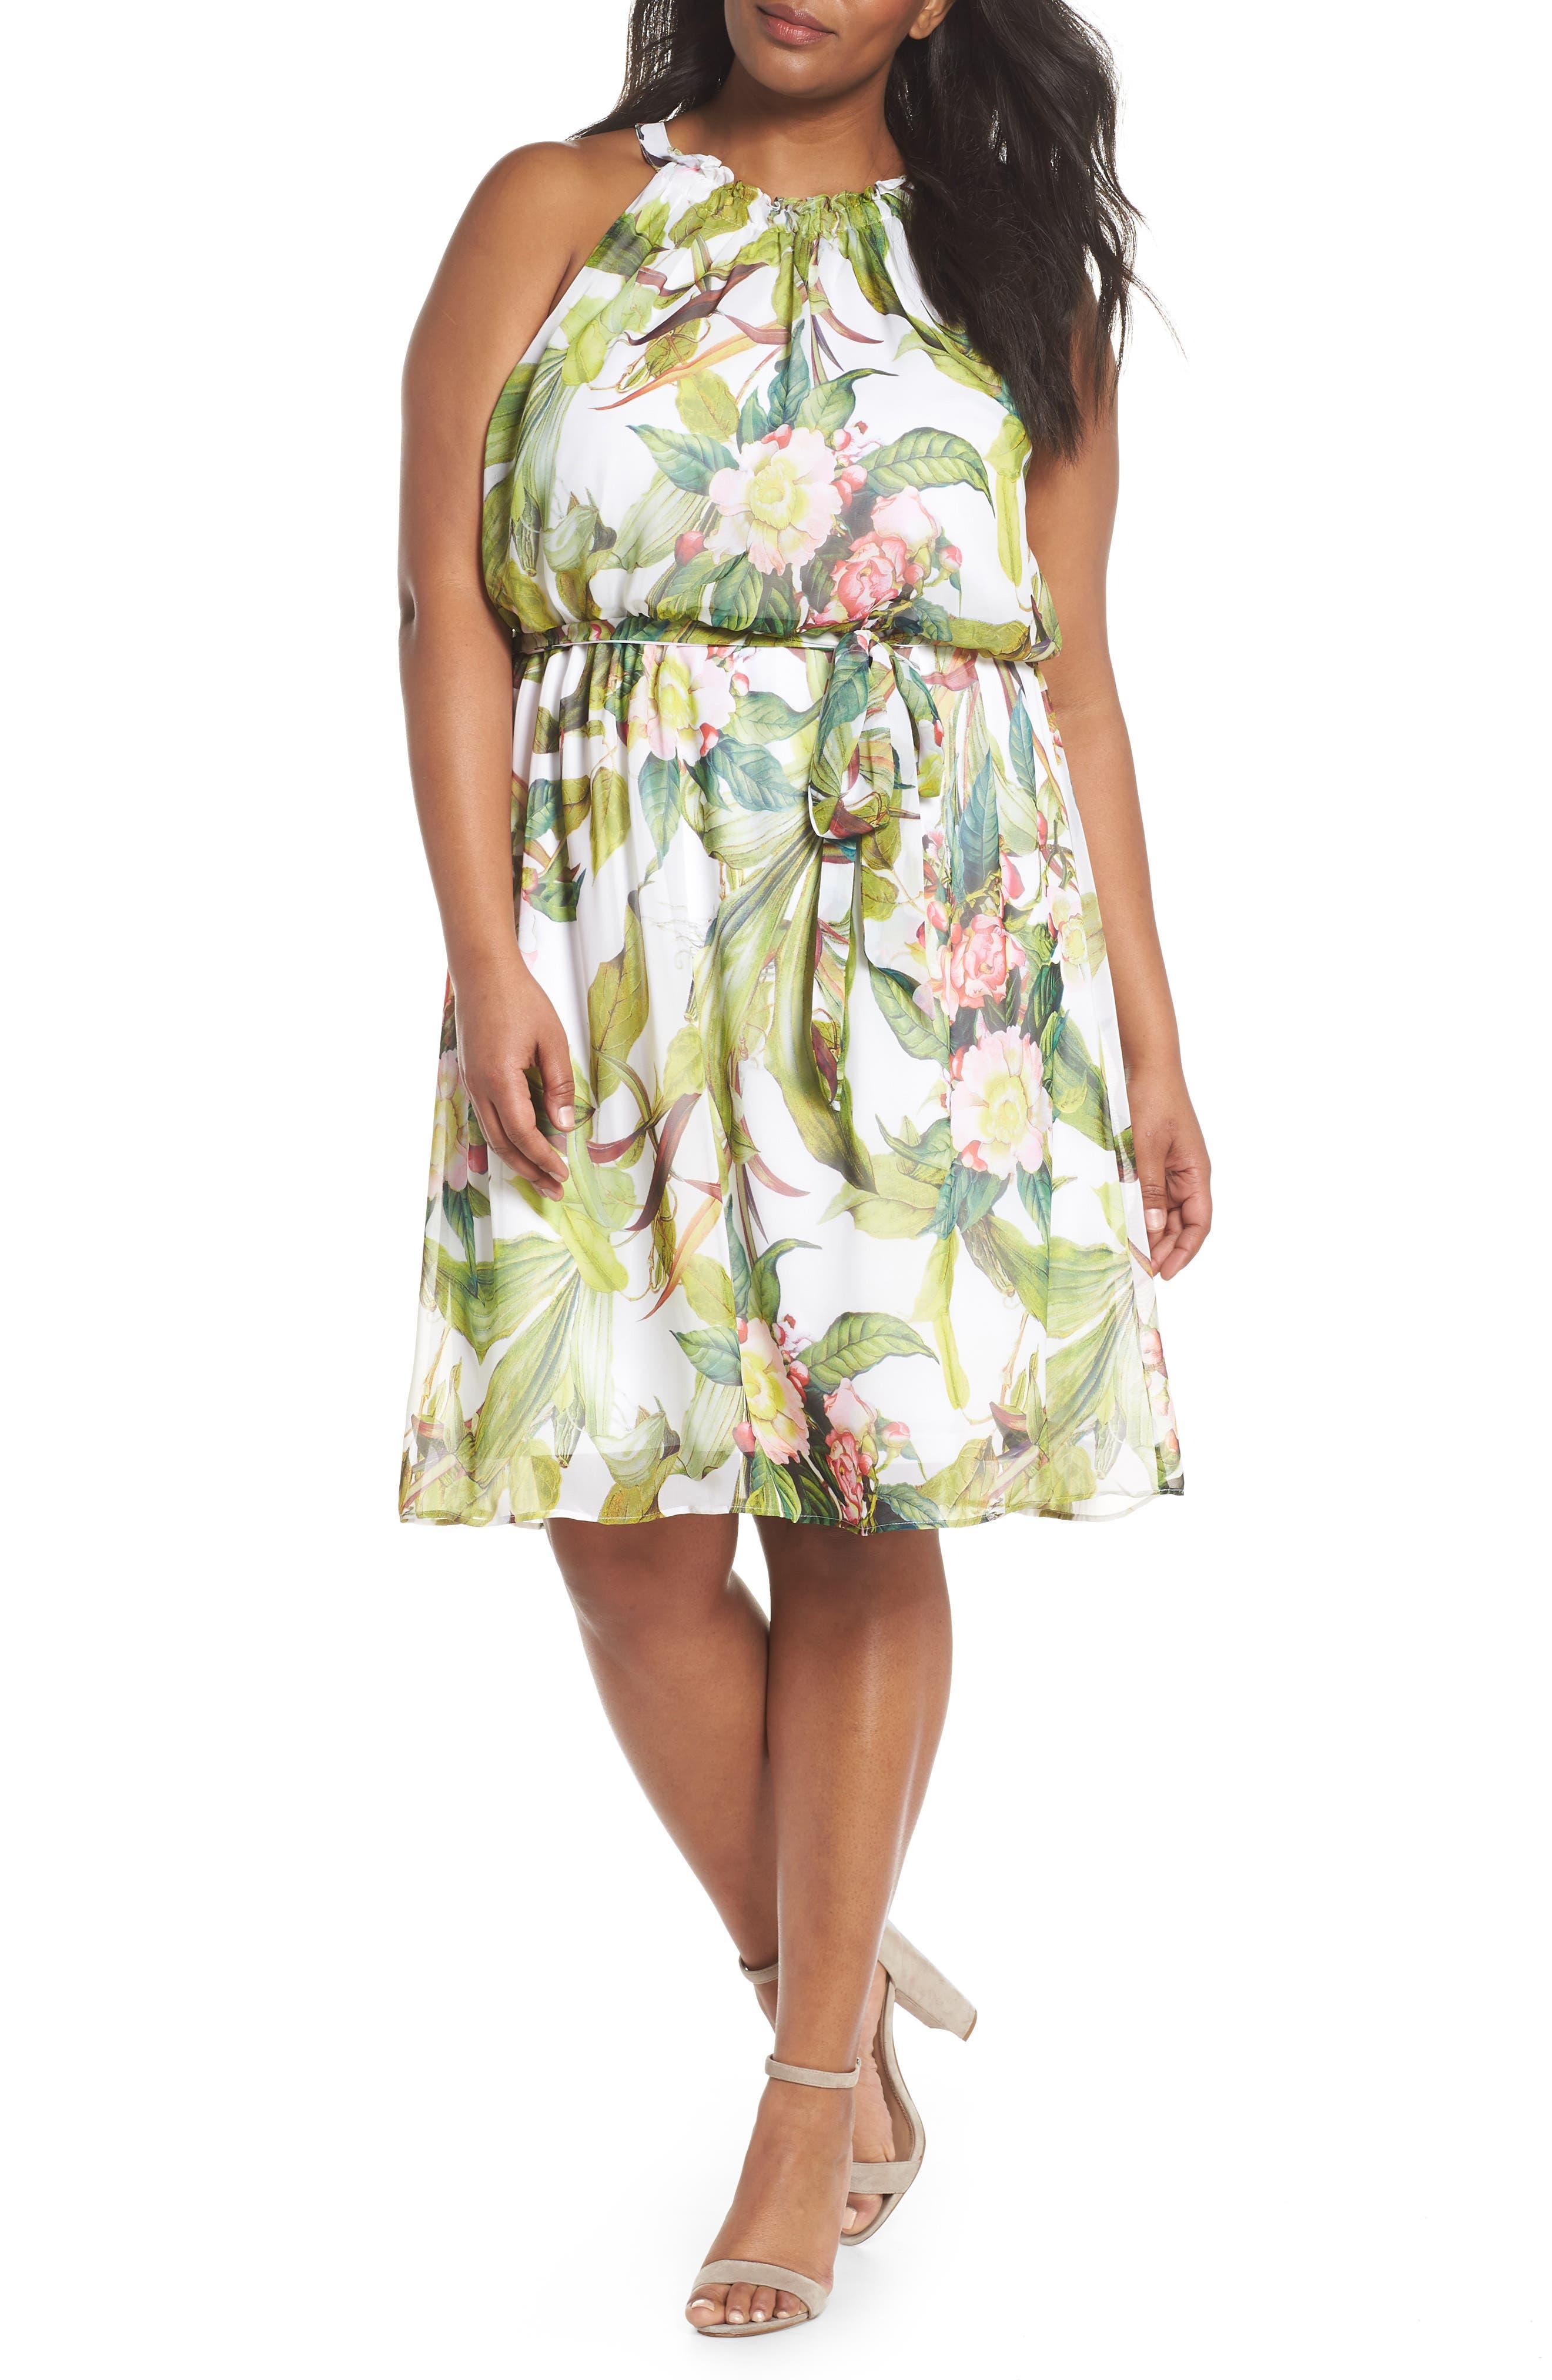 Adrianne Papell Tahitian Tropics Blouson Halter Dress,                             Main thumbnail 1, color,                             900